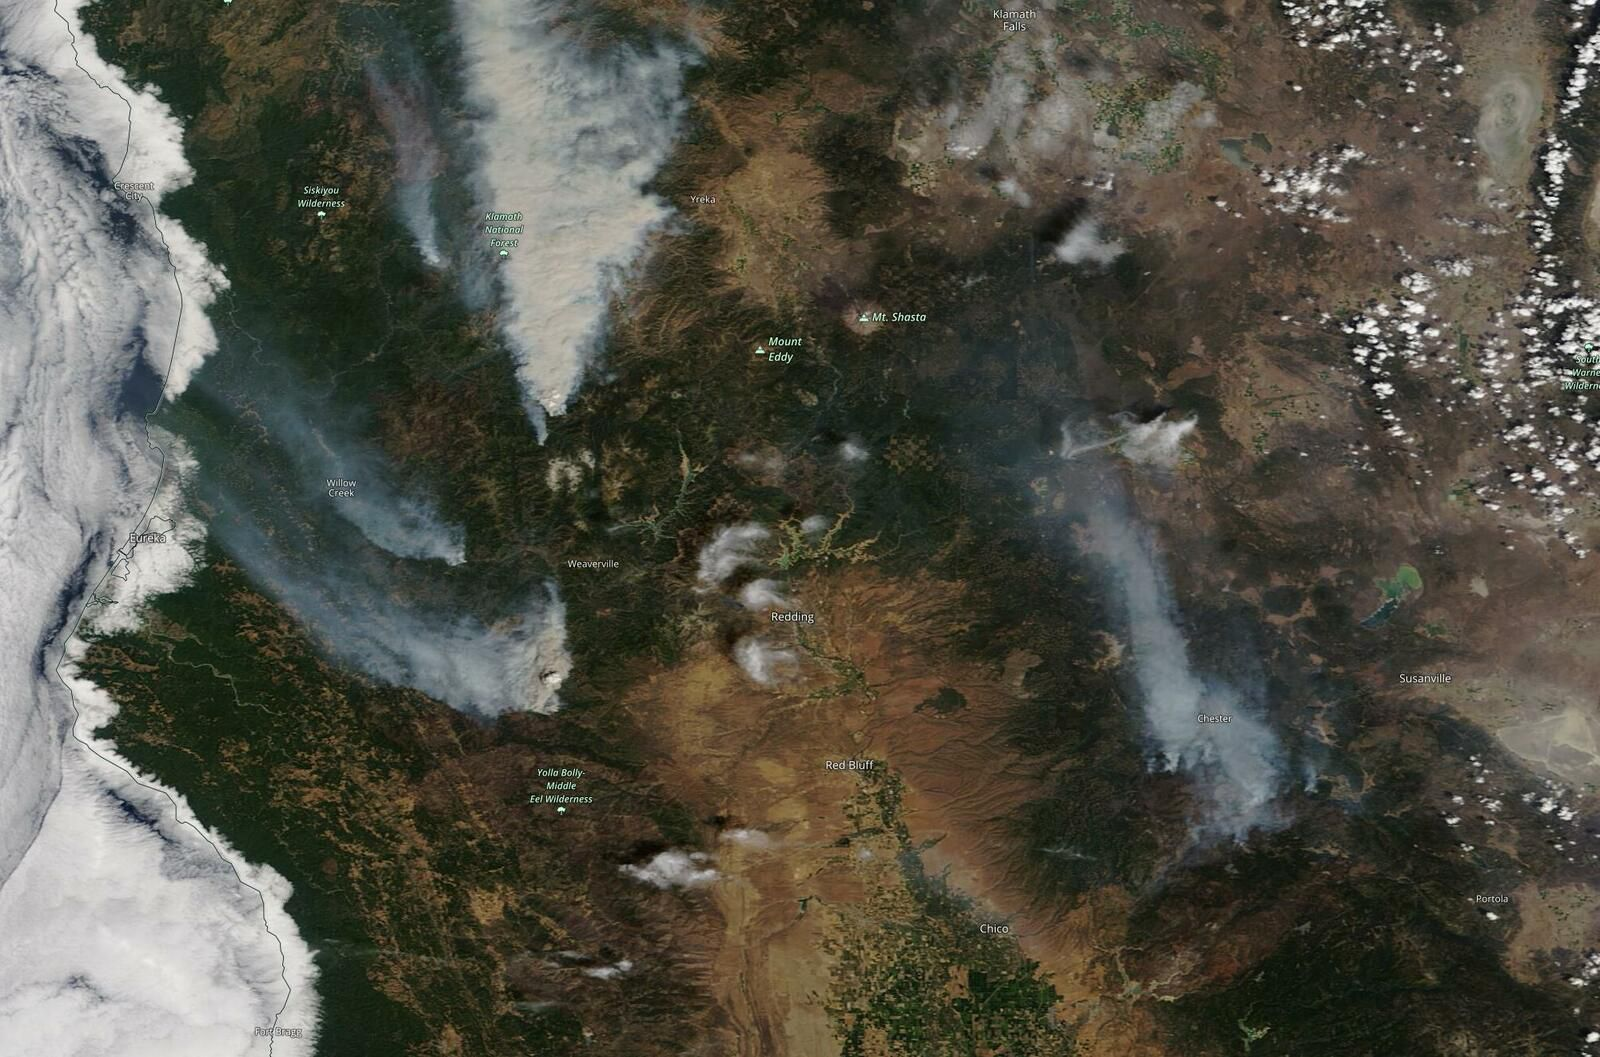 Dixie Fire - California wild fire - Terra MODIS - Incendies - Earth Observation - Observation de la Terre - Satellite - Pyrocumulus